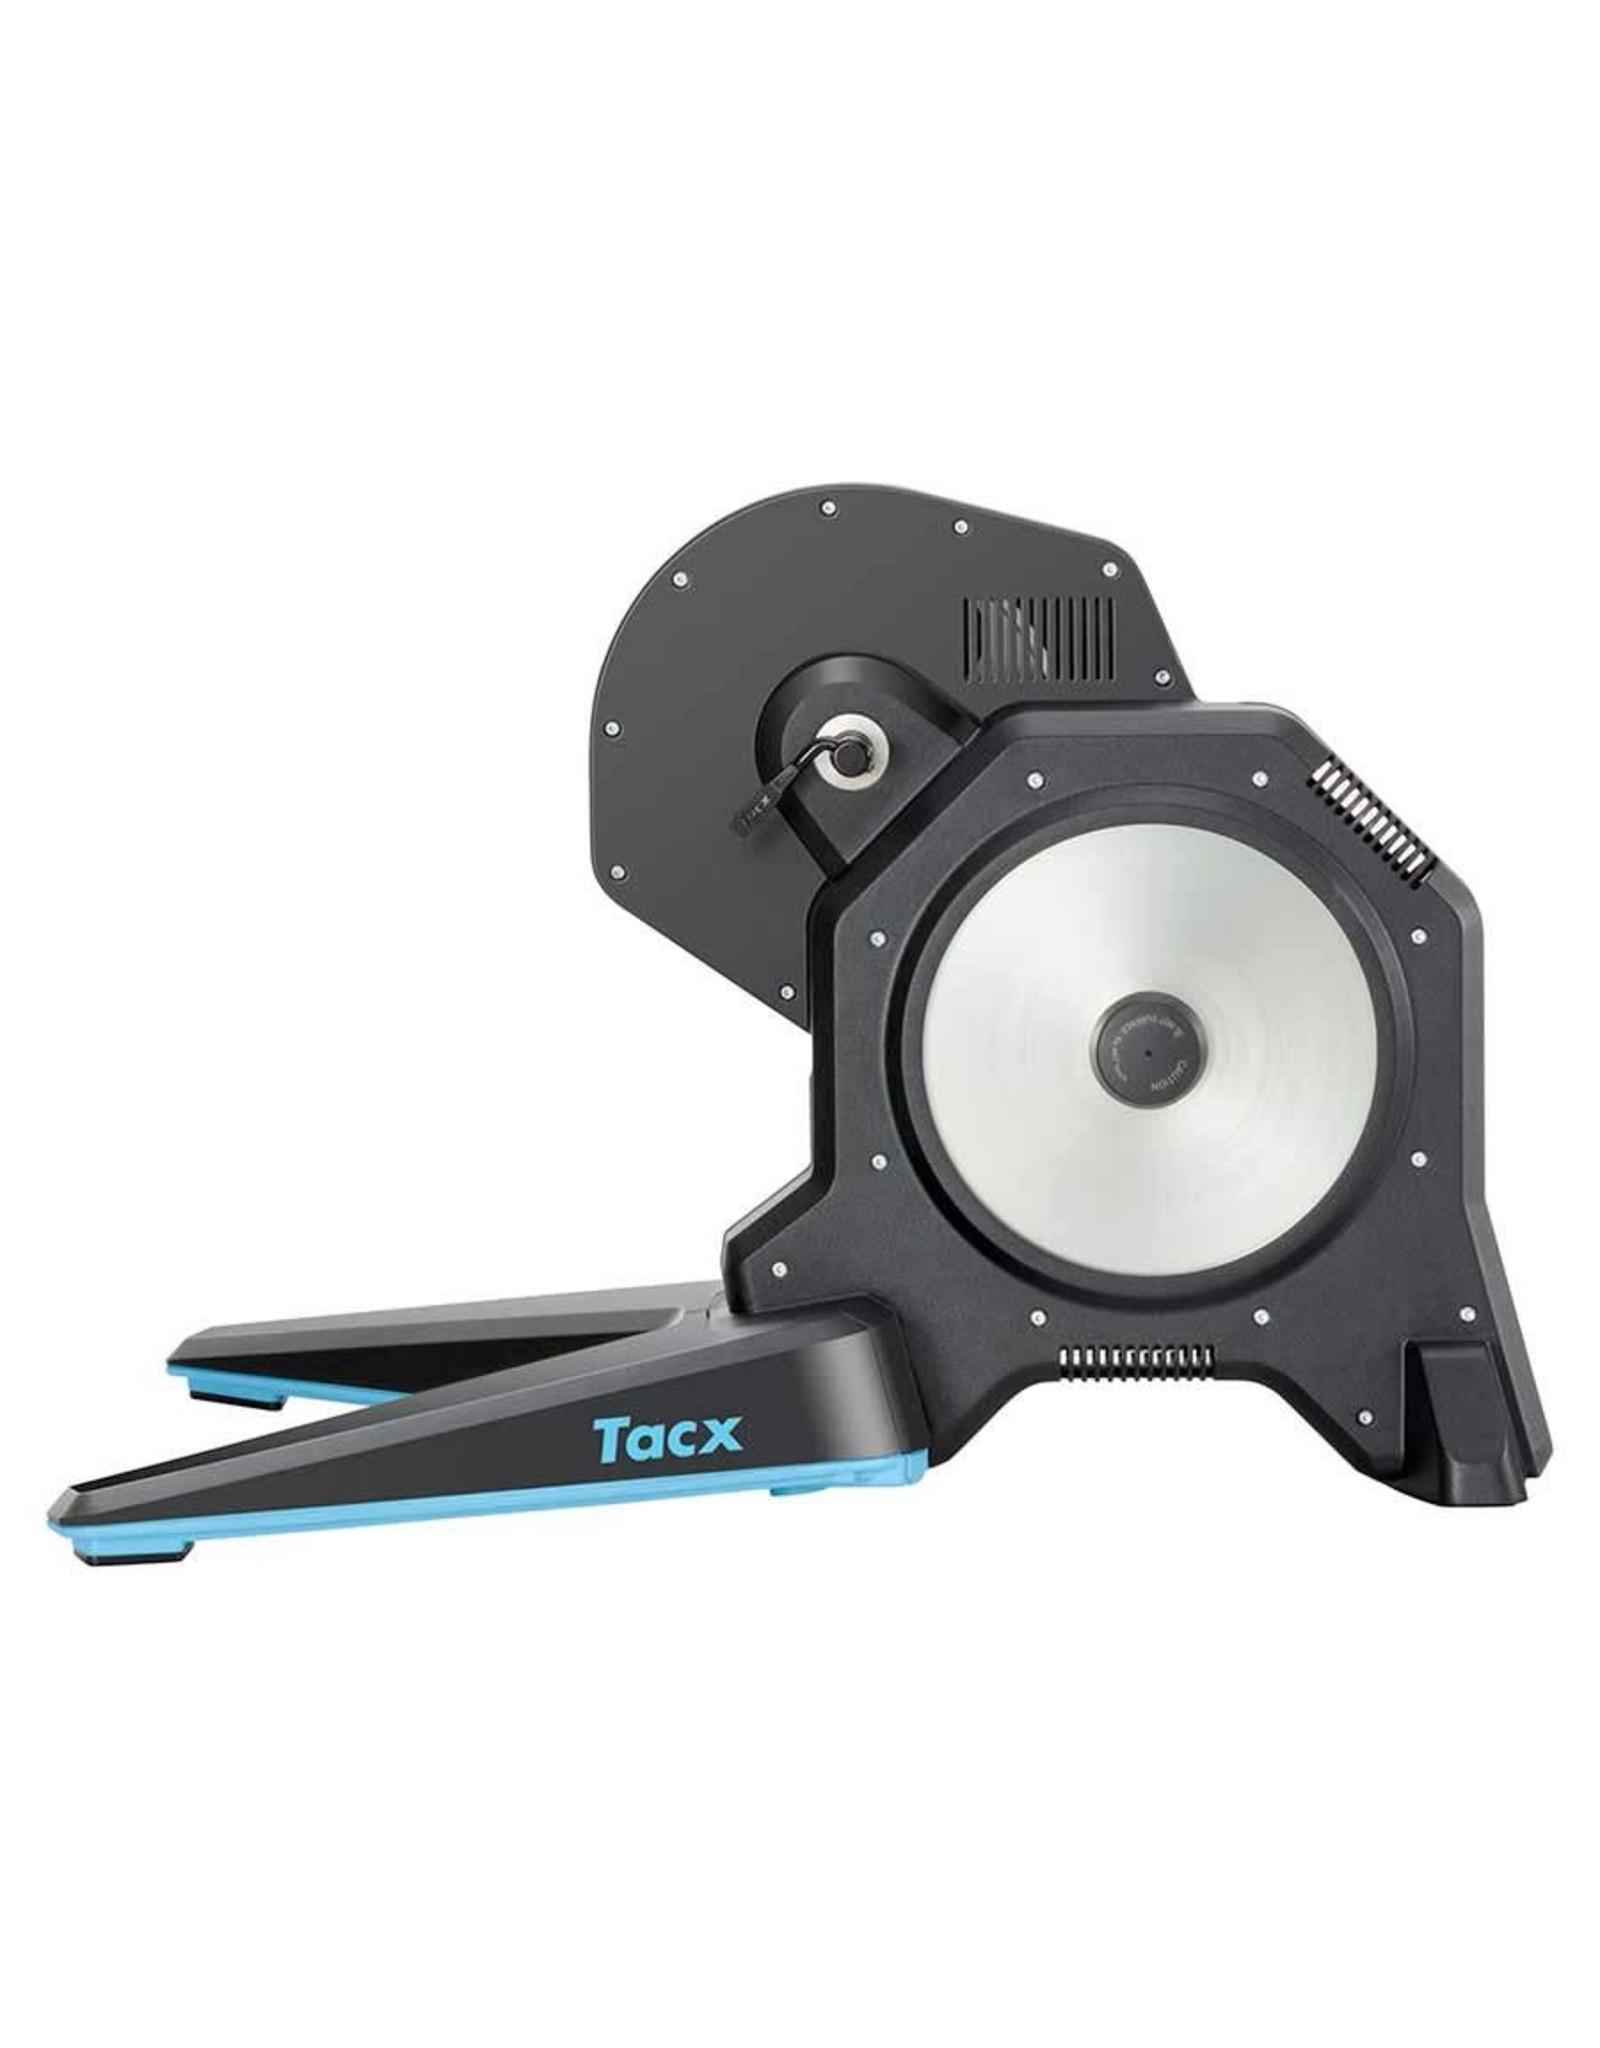 Tacx, Flux 2 Smart, Trainer, Magnetic